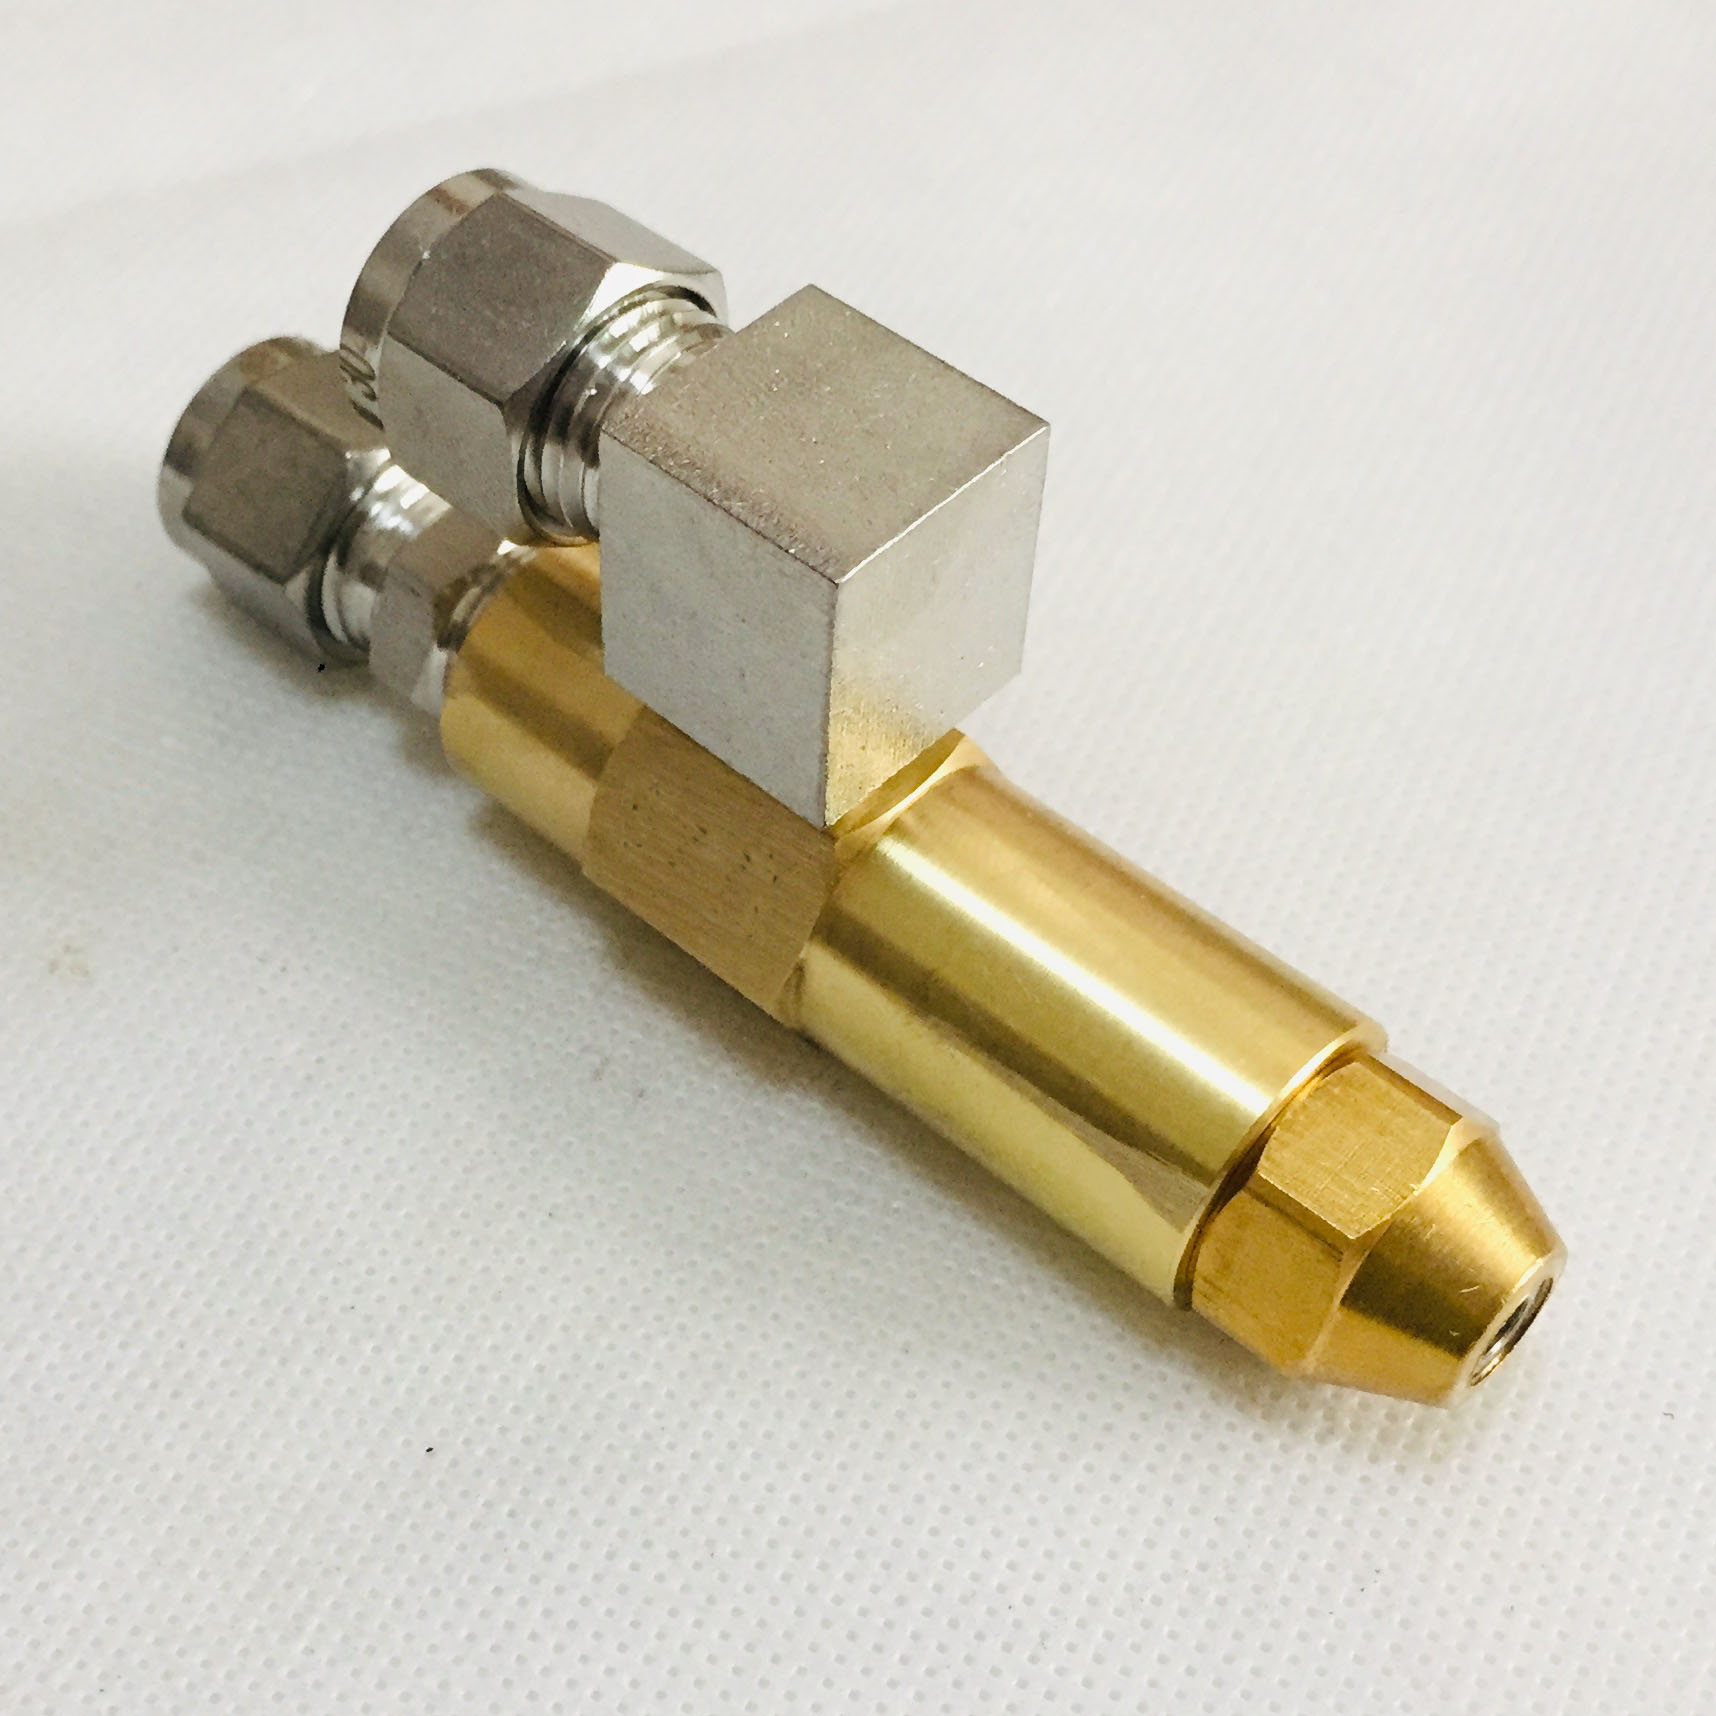 Image 3 - 68mm 0.5/0.8/1.0/1.2/1.5/2.0/2.5/3.0mm Waste oil burner  nozzle,air atomizing nozzle,fuel oil nozzle,full cone oil spray  nozzleSprayers